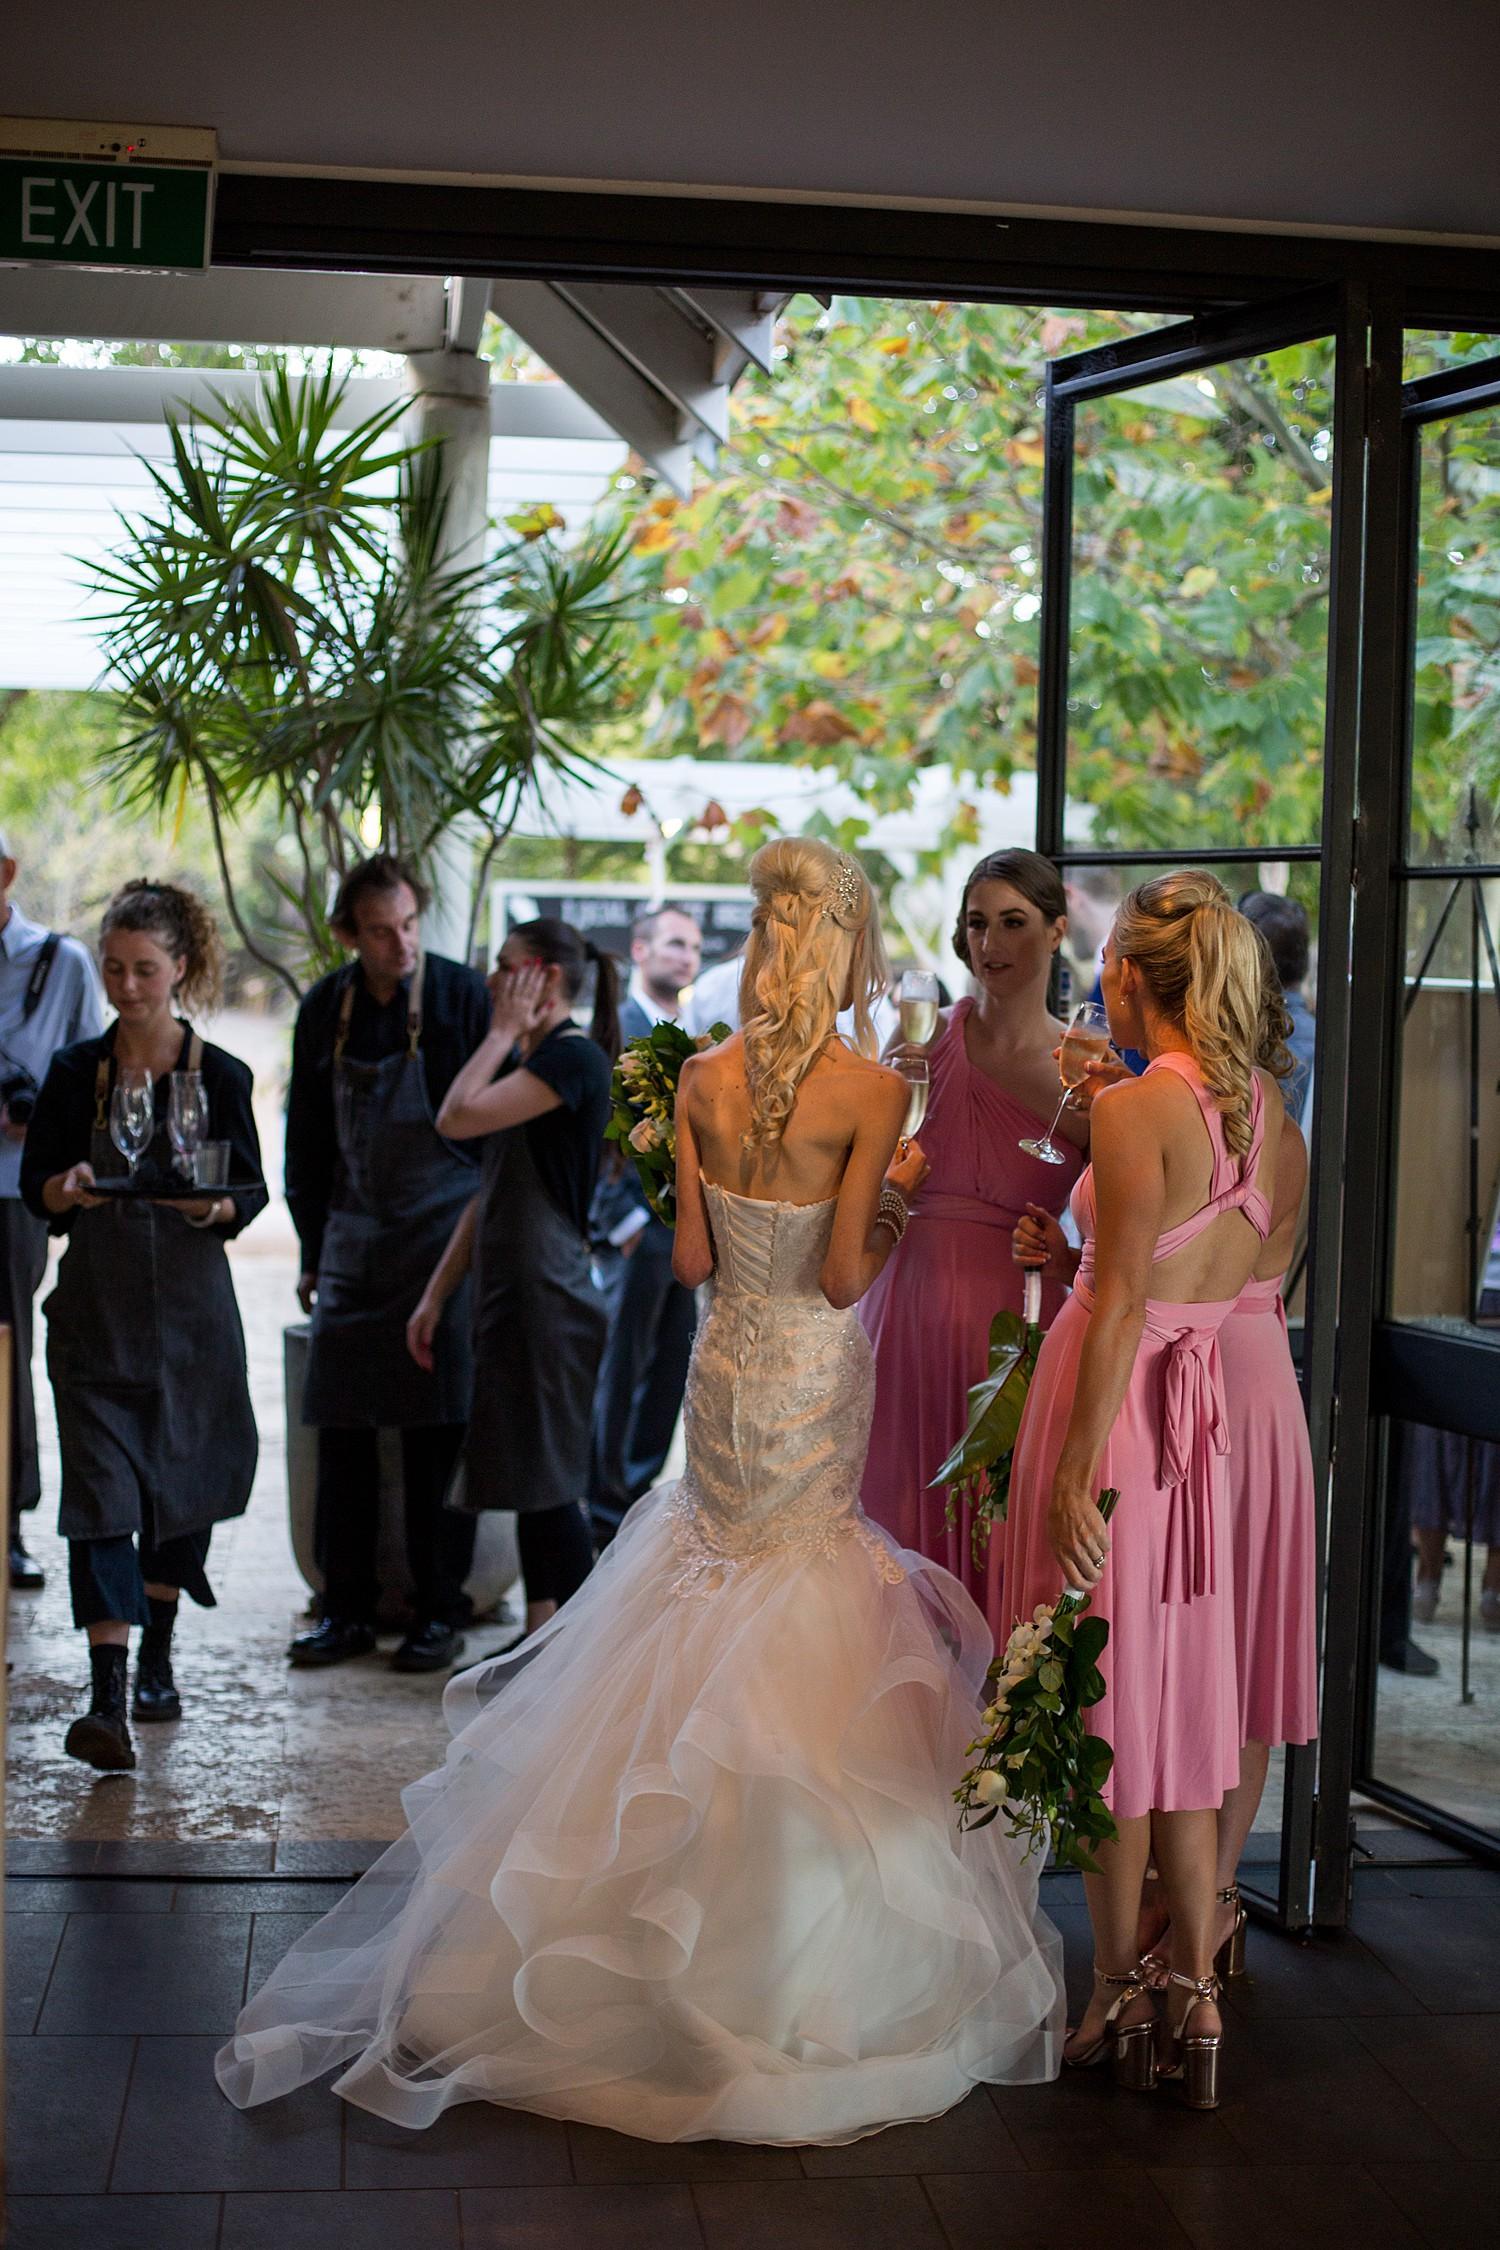 wise_wines_southwest_WA_wedding_0139.jpg